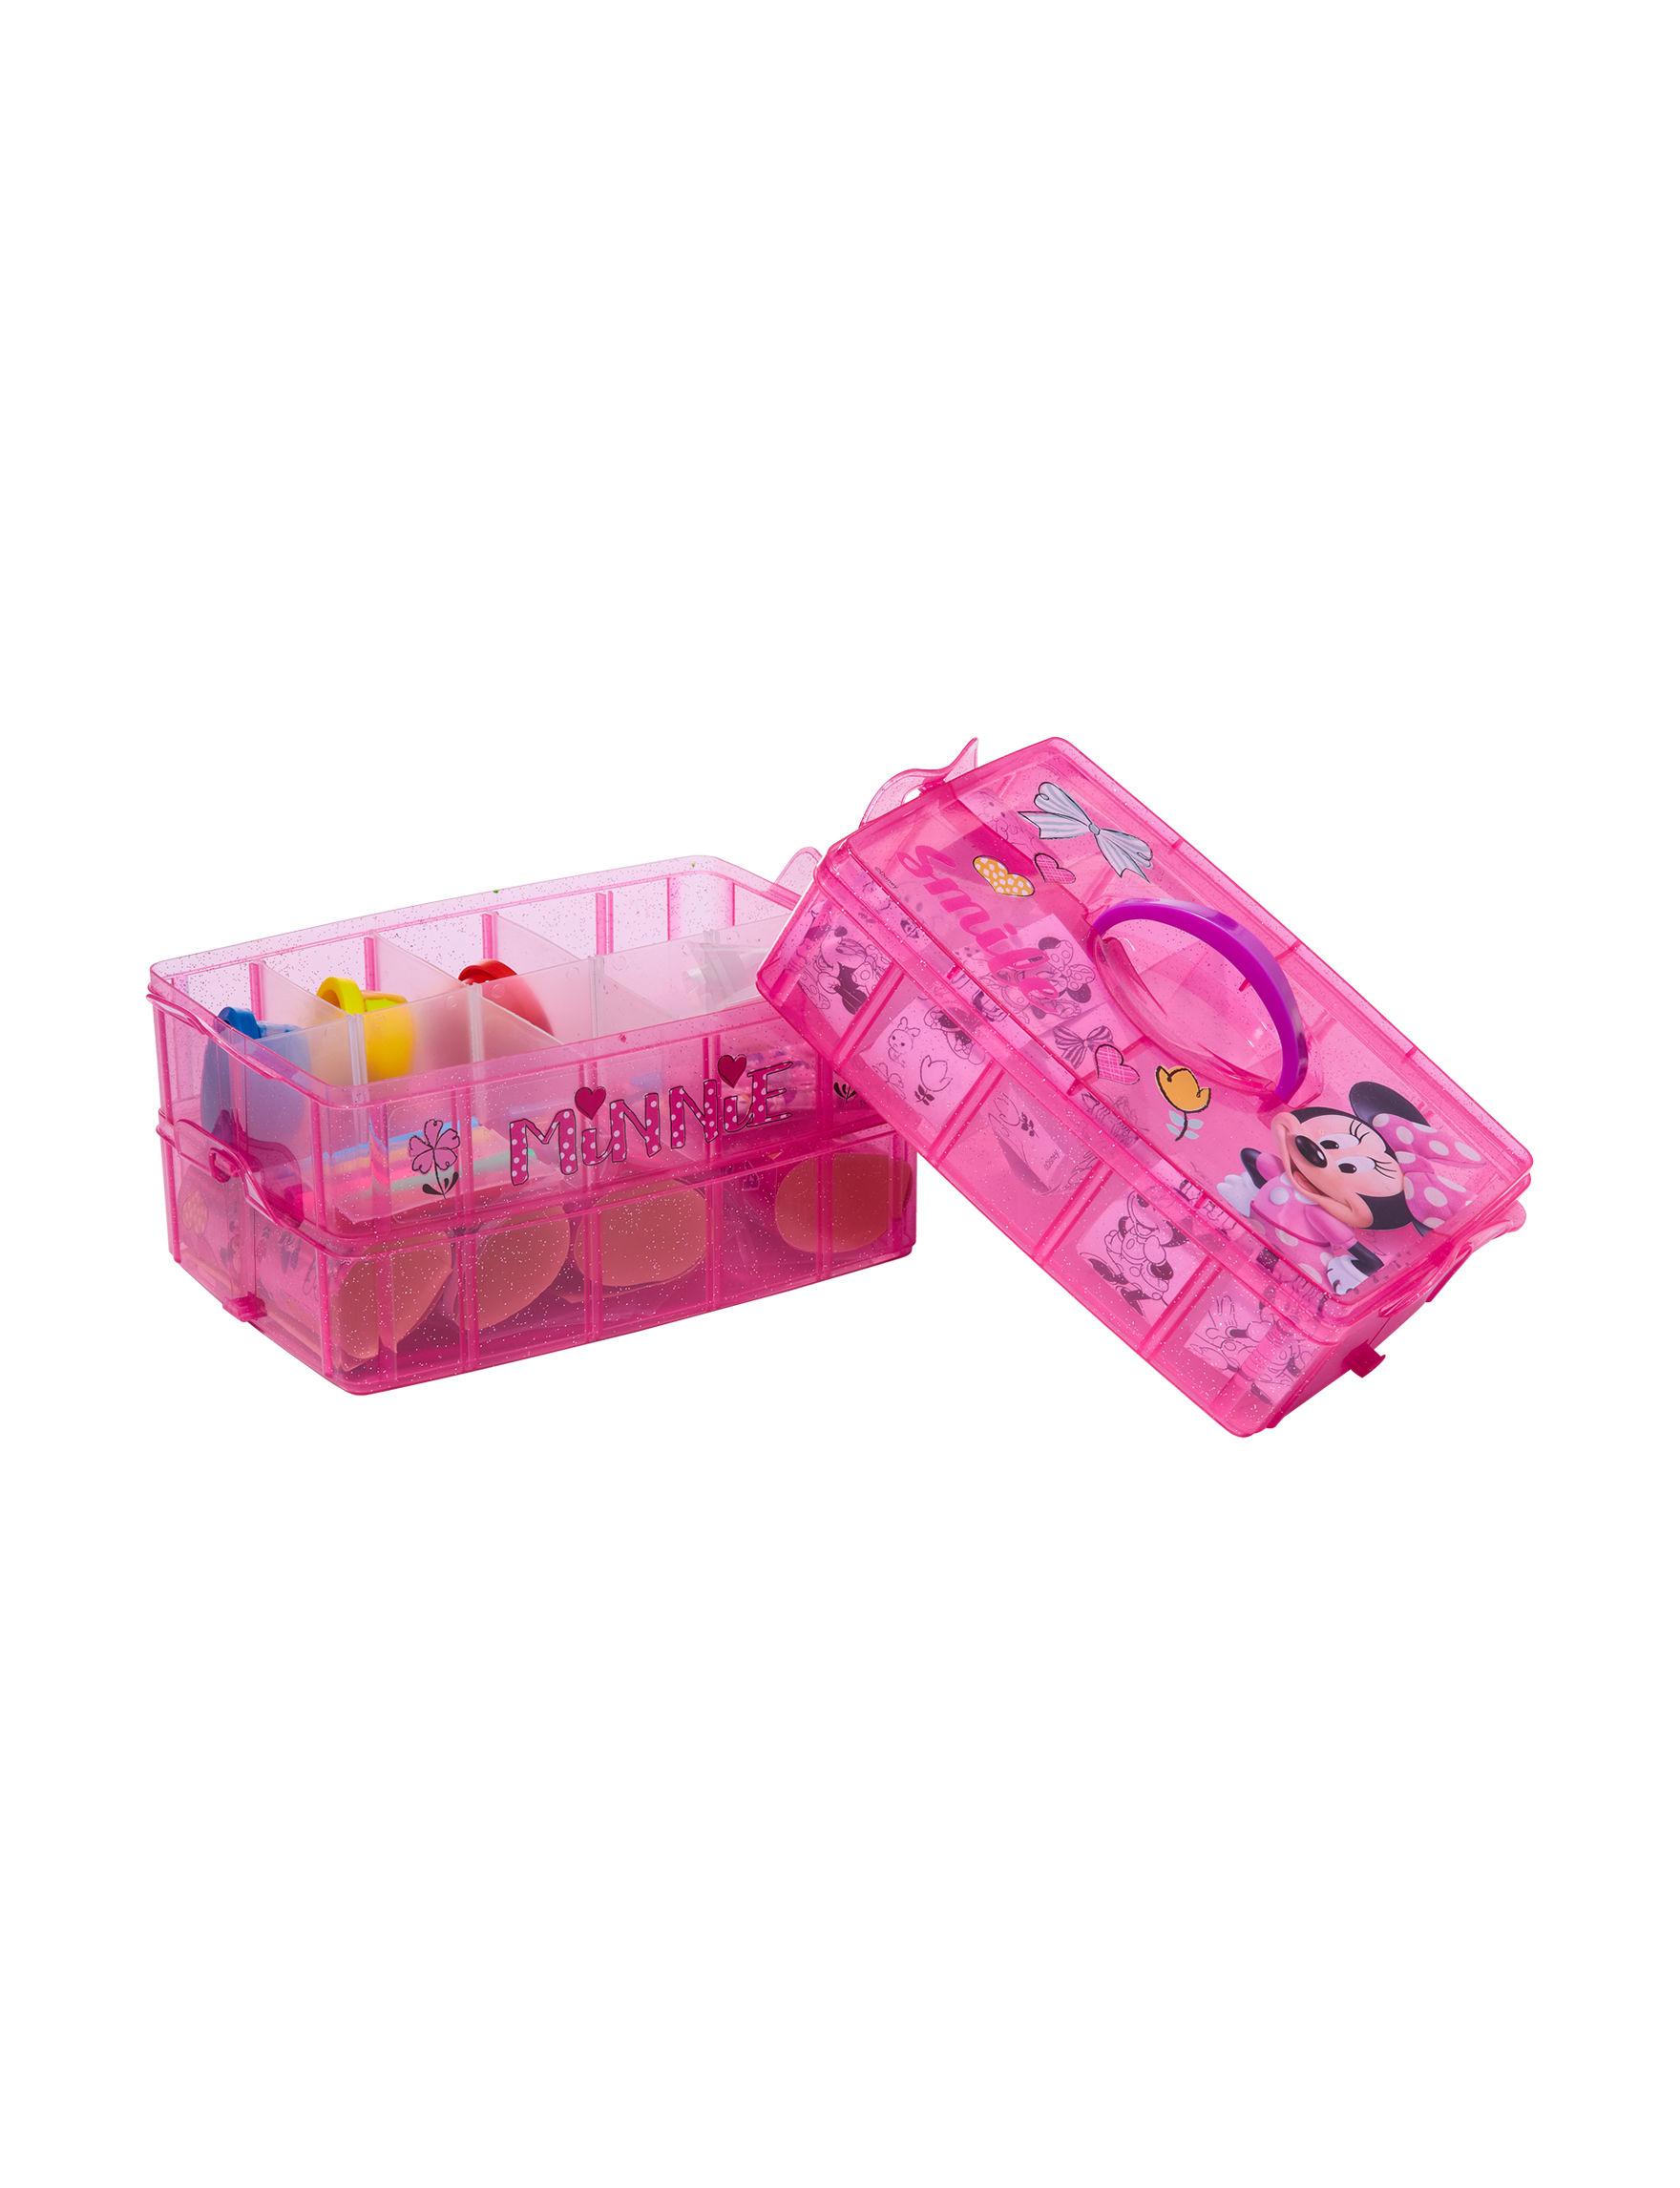 Licensed Pink School & Office Supplies